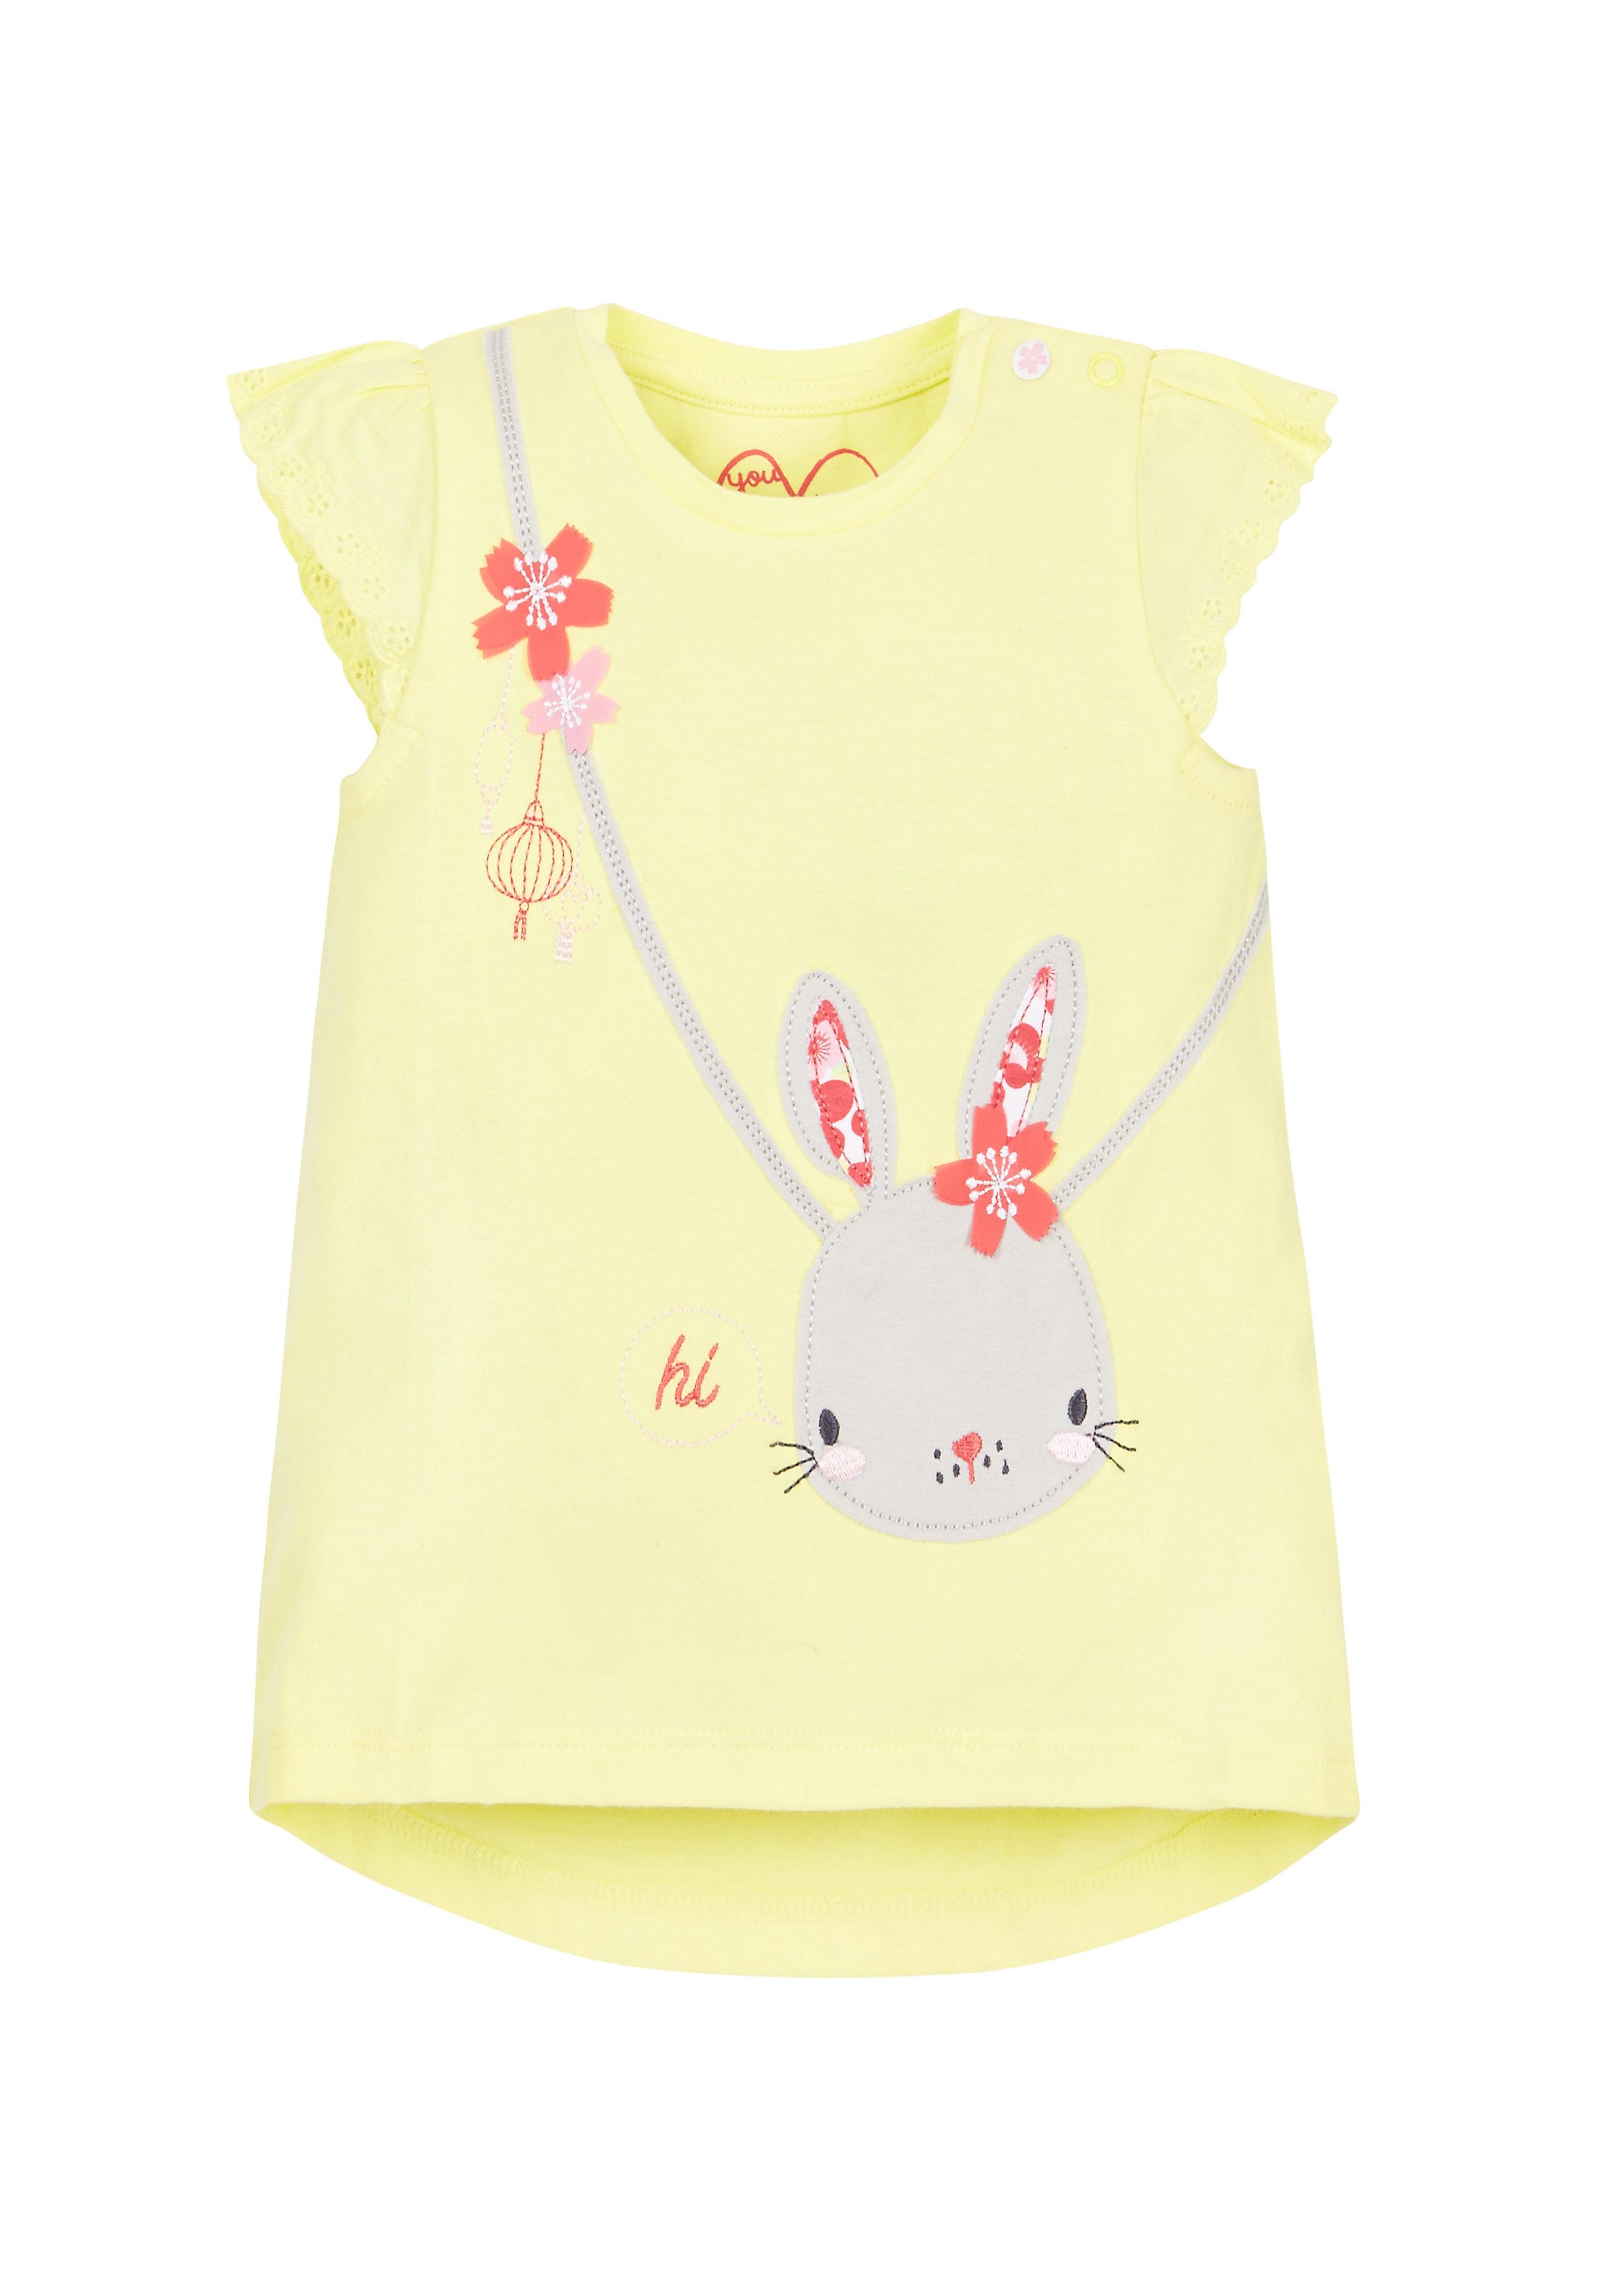 Mothercare | Girls Bunny Bag T-Shirt  - Yellow